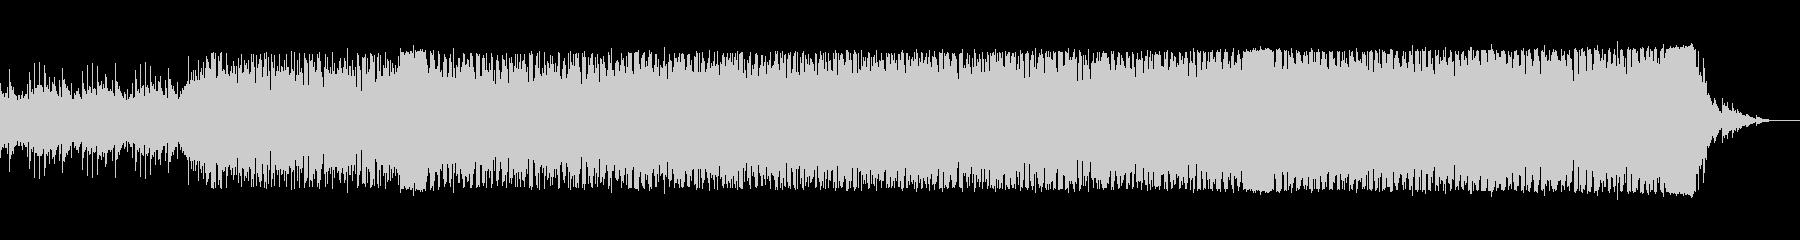 bpm133のピアノ主体の不気味なテクノの未再生の波形